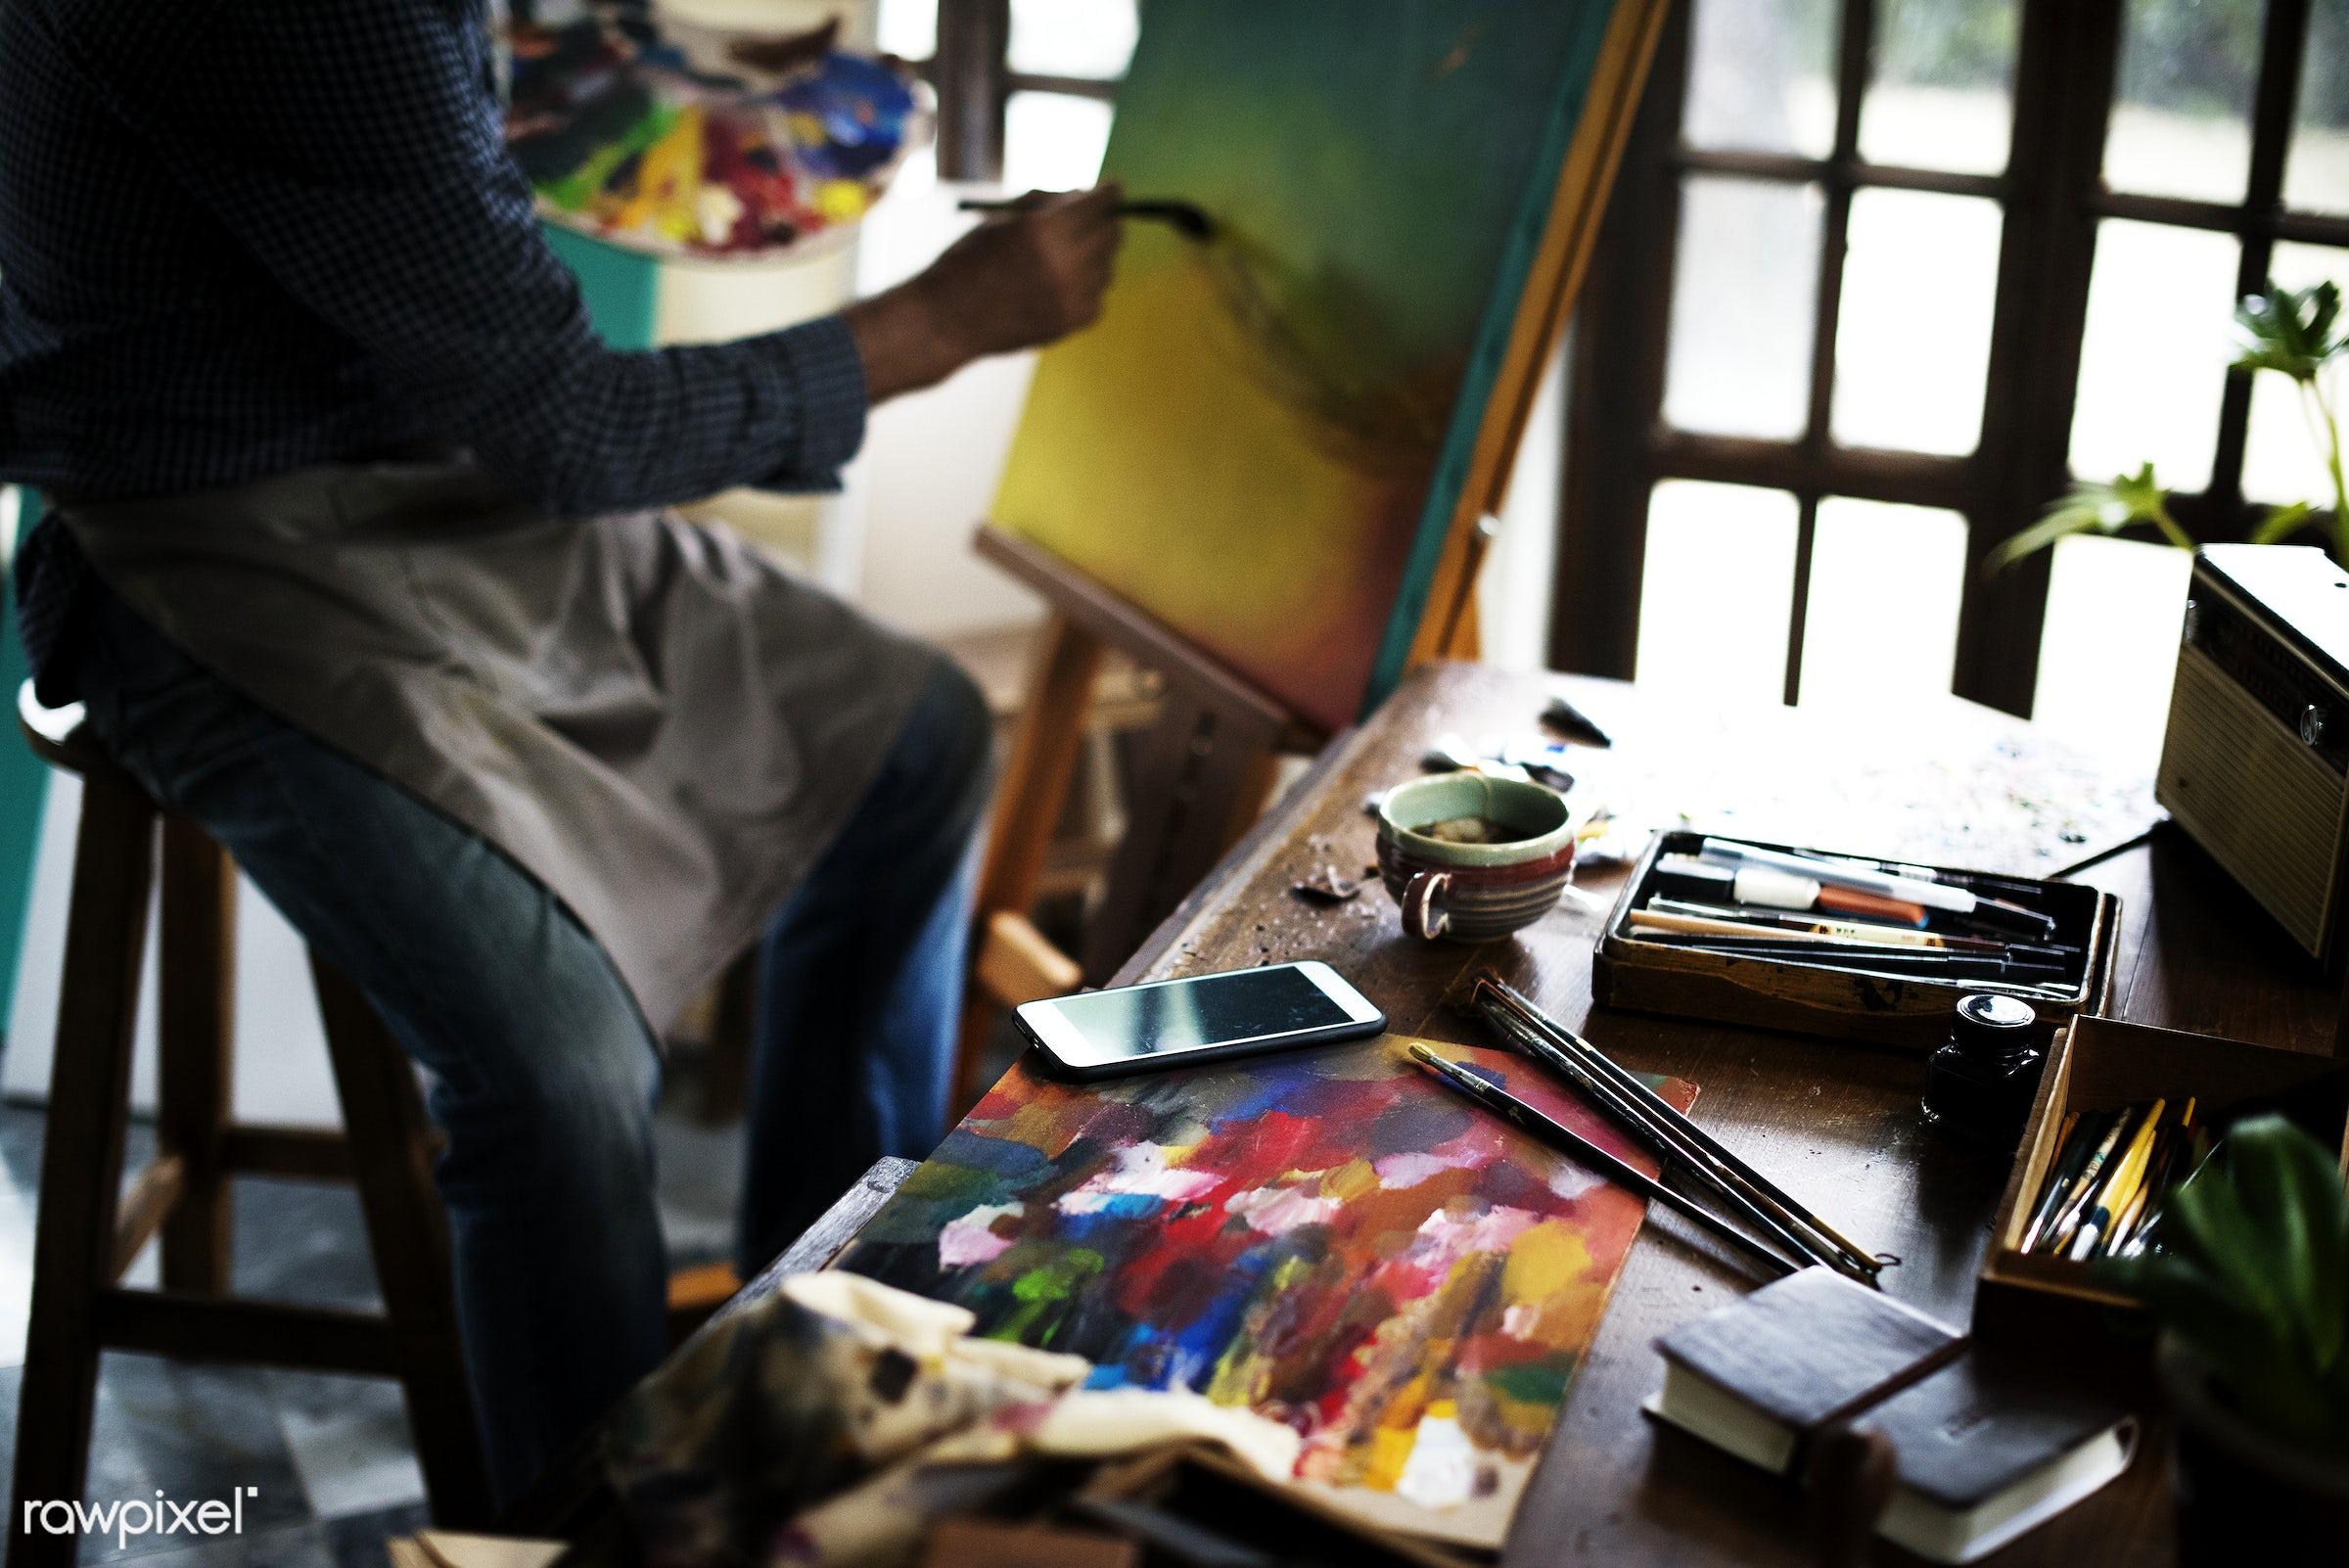 colorful, workspace, recreation, mobile phone, artist, painter, closeup, work, creative, art, hobby, canvas, leisure, paint...